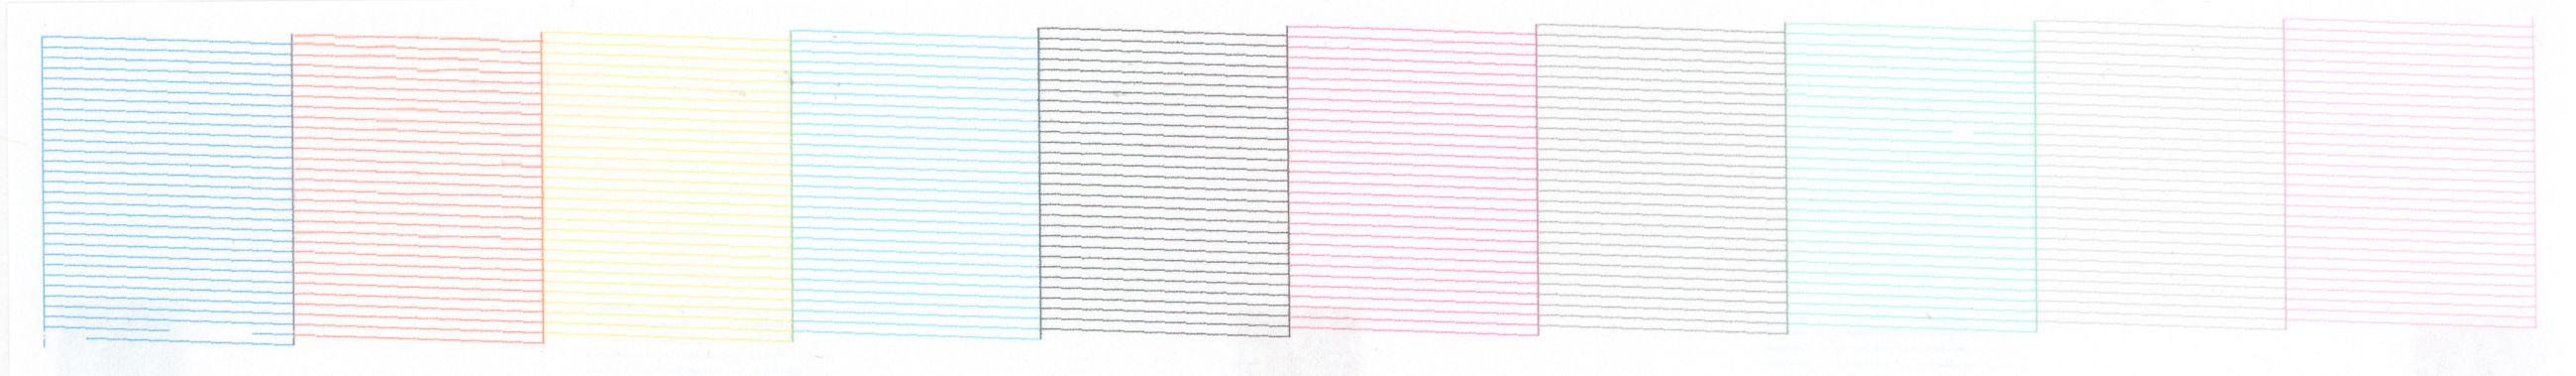 Solving Inkjet Printer Issues   Image Science